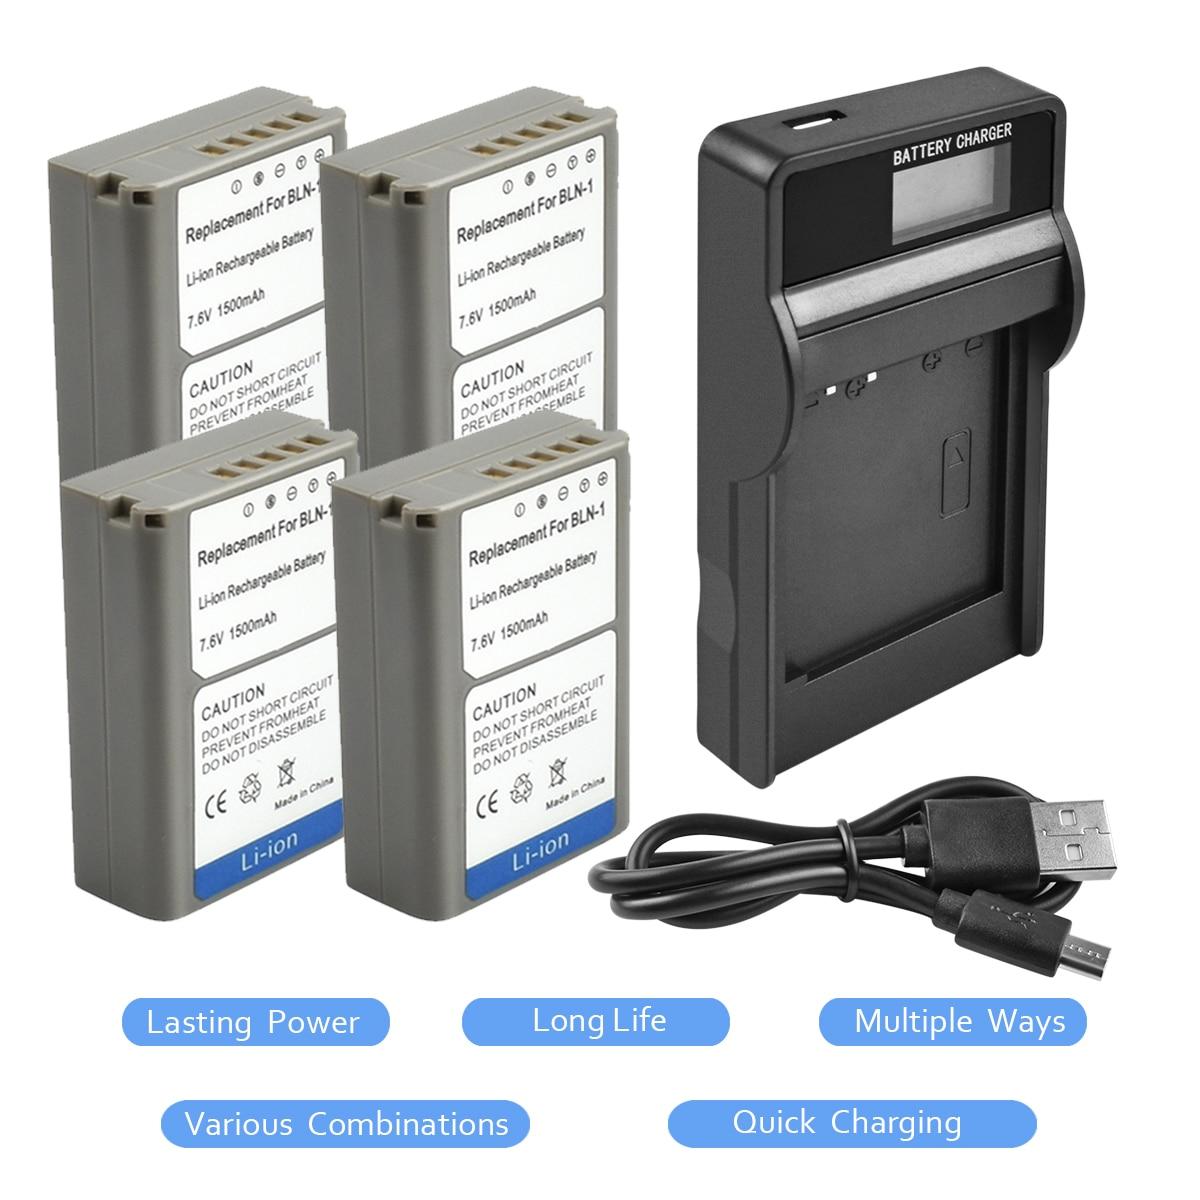 4Packs BLN-1 BLN1 PSBLN1 Battery 7.4V 1500mAh +1Port Battery charger with LED for Olympus E-M5 OM-D E-M1 E-P5 E-M5 II Camera L10